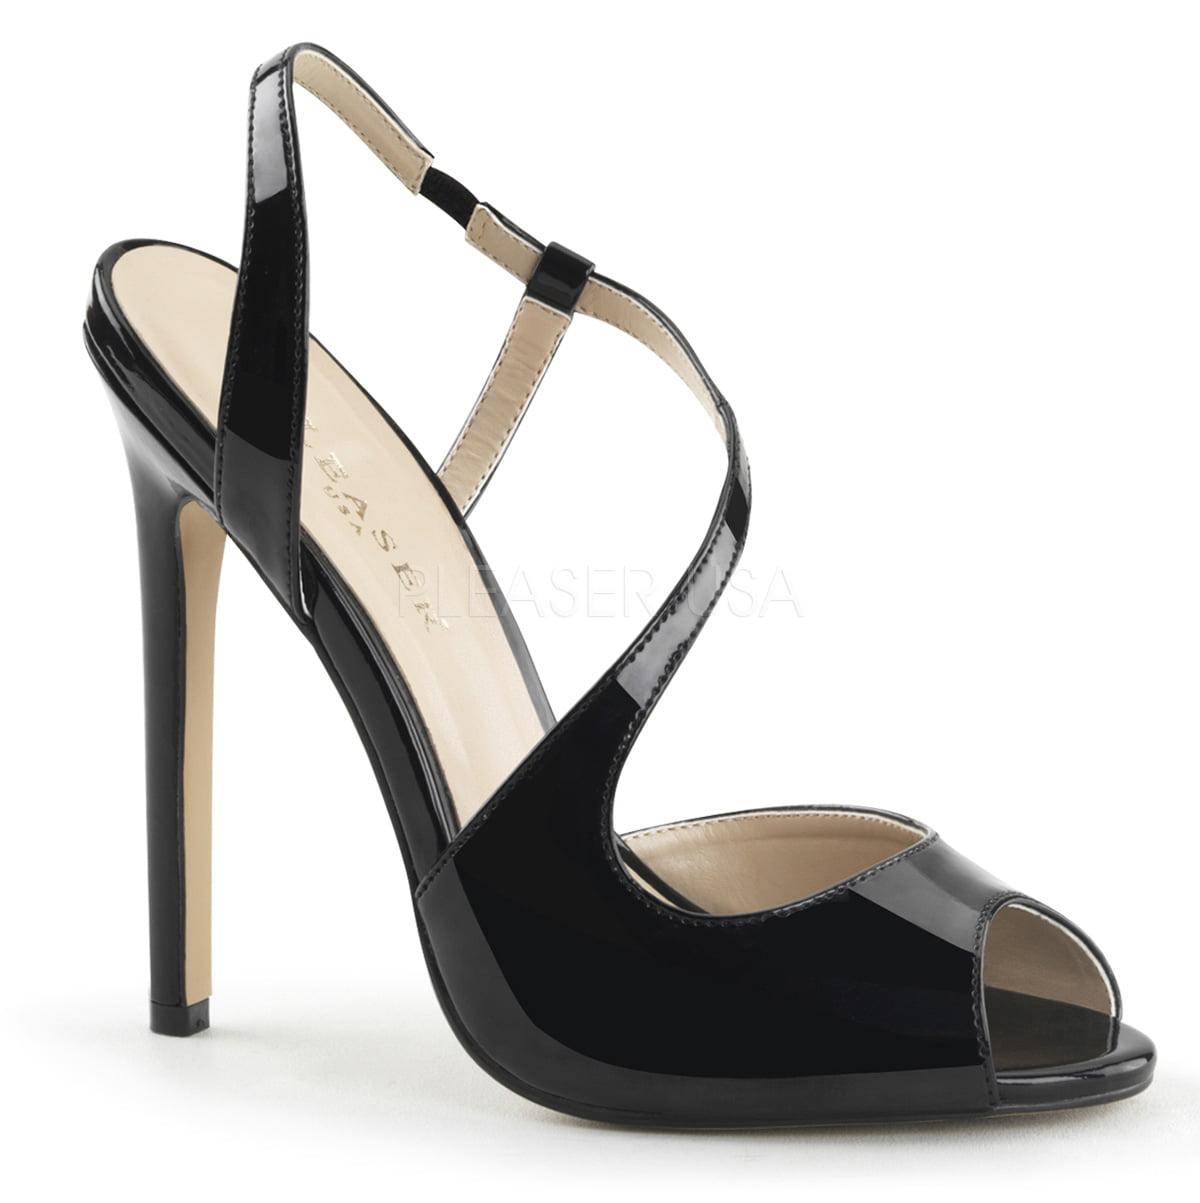 SEXY-10, 5 Inch Heel Sling Back Asymmetric Strappy Sandal